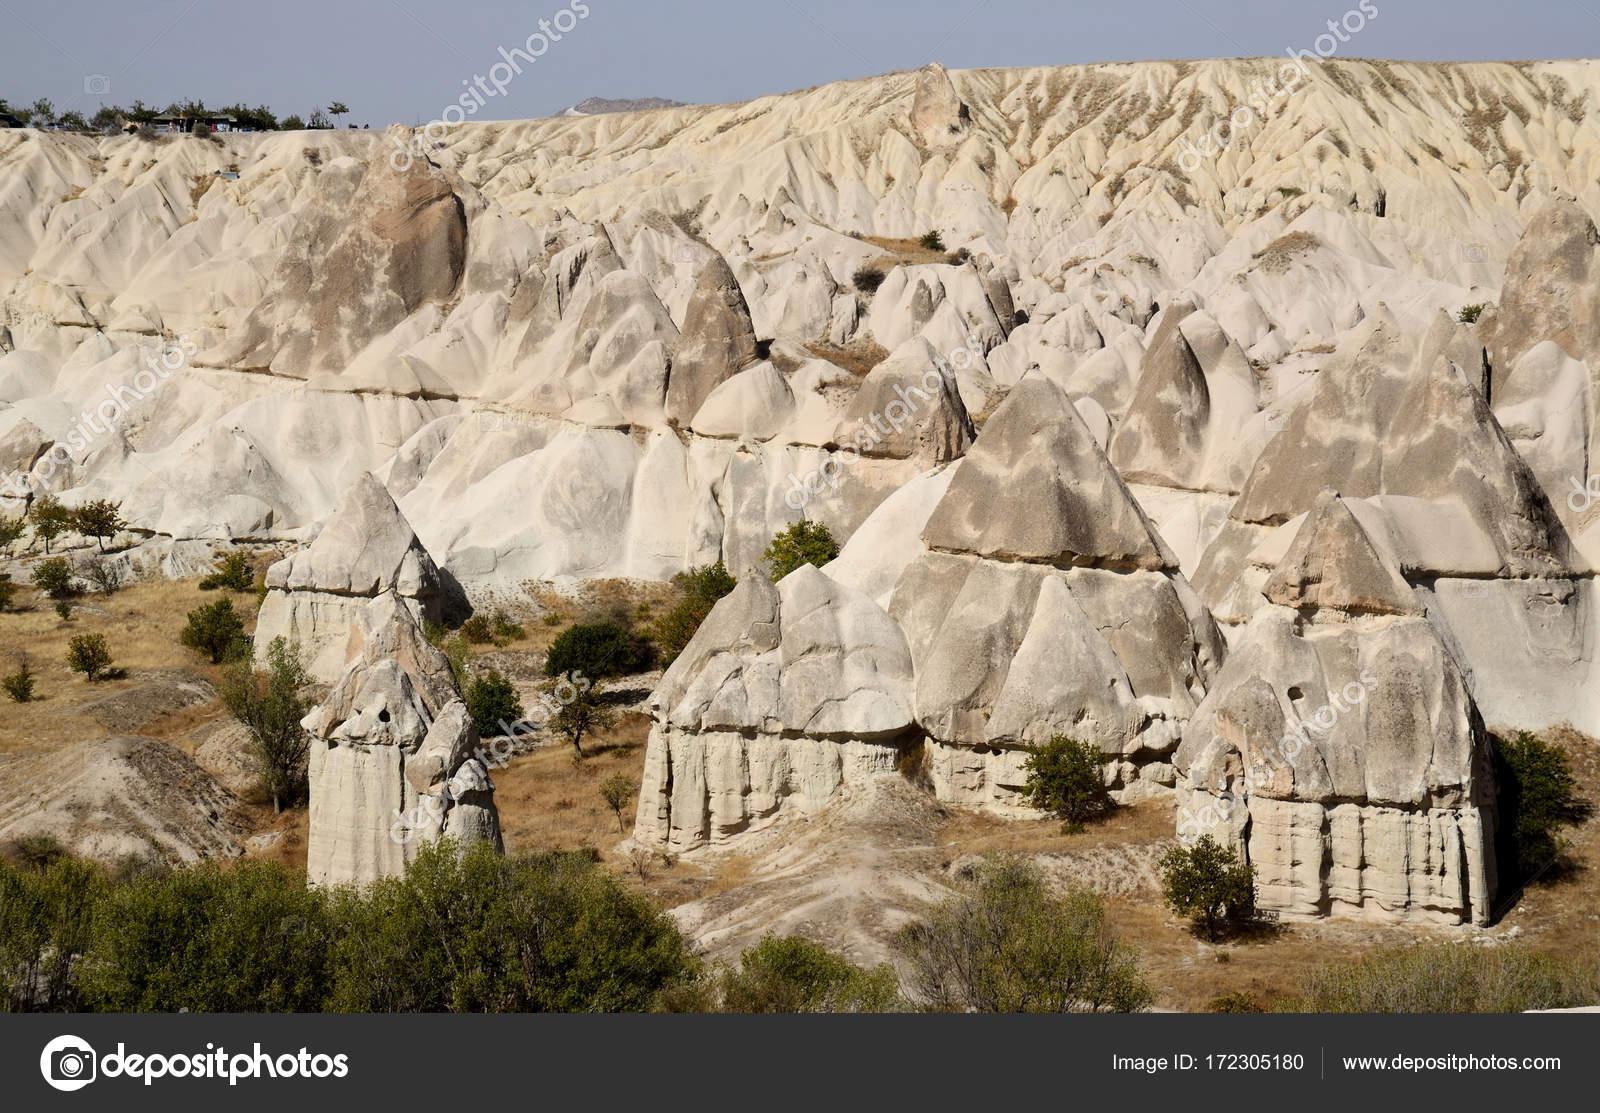 Formations De Roche Geologique De Cheminee De Fee Dans La Vallee De